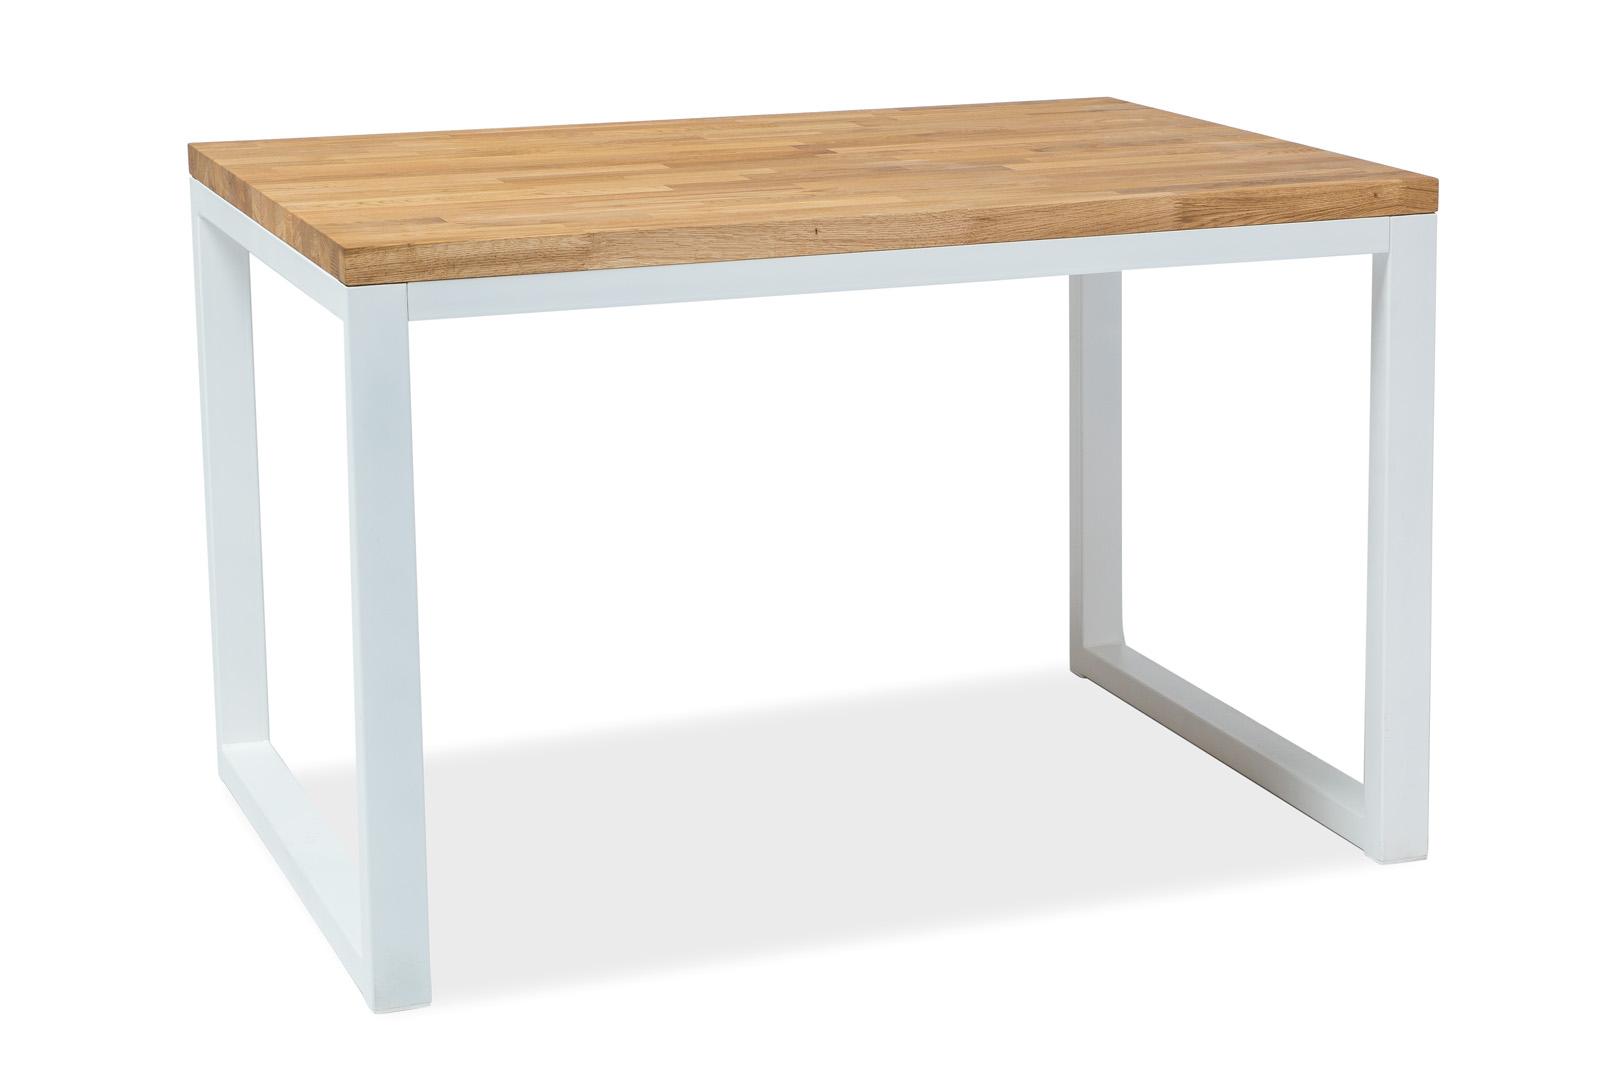 Signal Jedálenský stôl Loras II Prevedenie: Biela - 77 x 90 x 180 cm